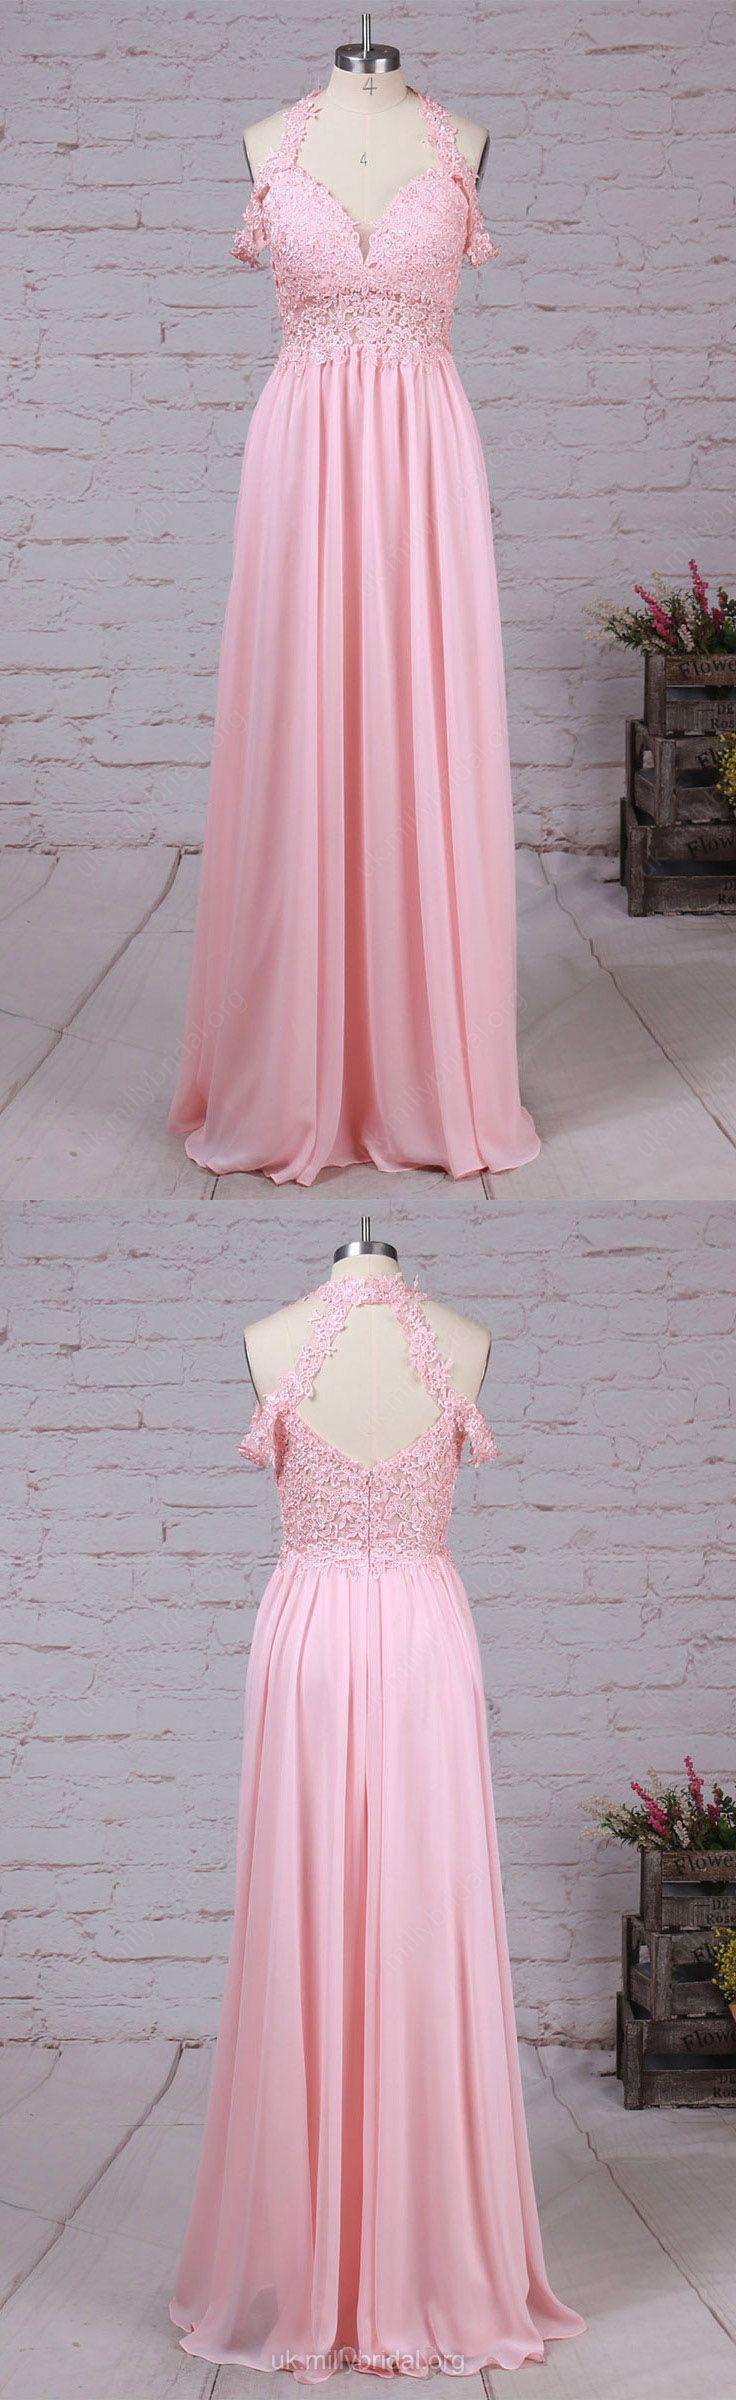 Pink prom dresseslong prom dressesmodest prom dresses chiffon